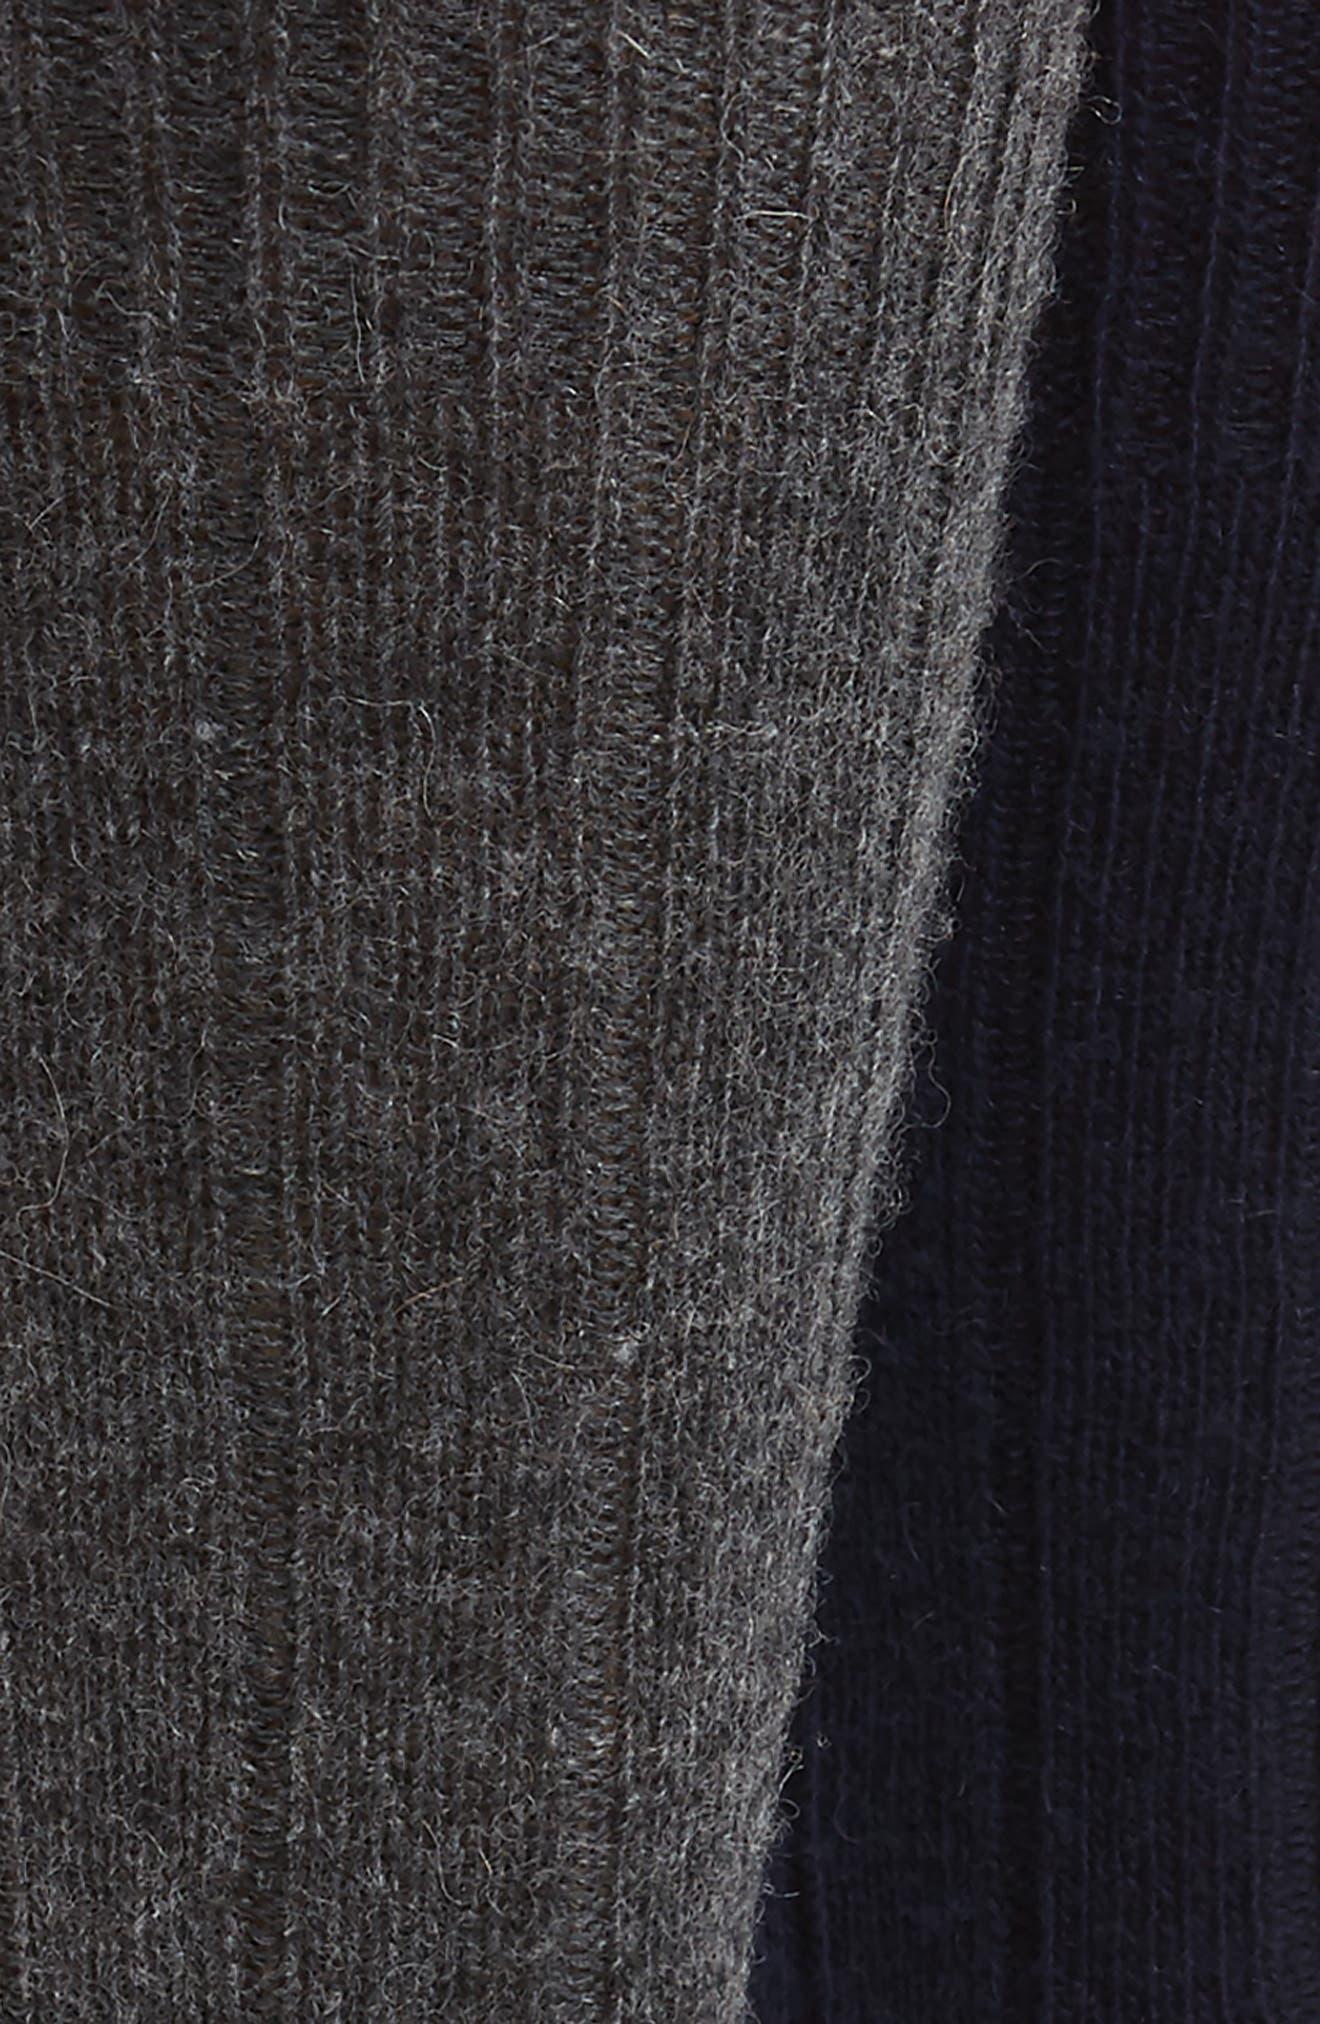 2-Pack Cashmere Blend Socks Box Set,                             Alternate thumbnail 6, color,